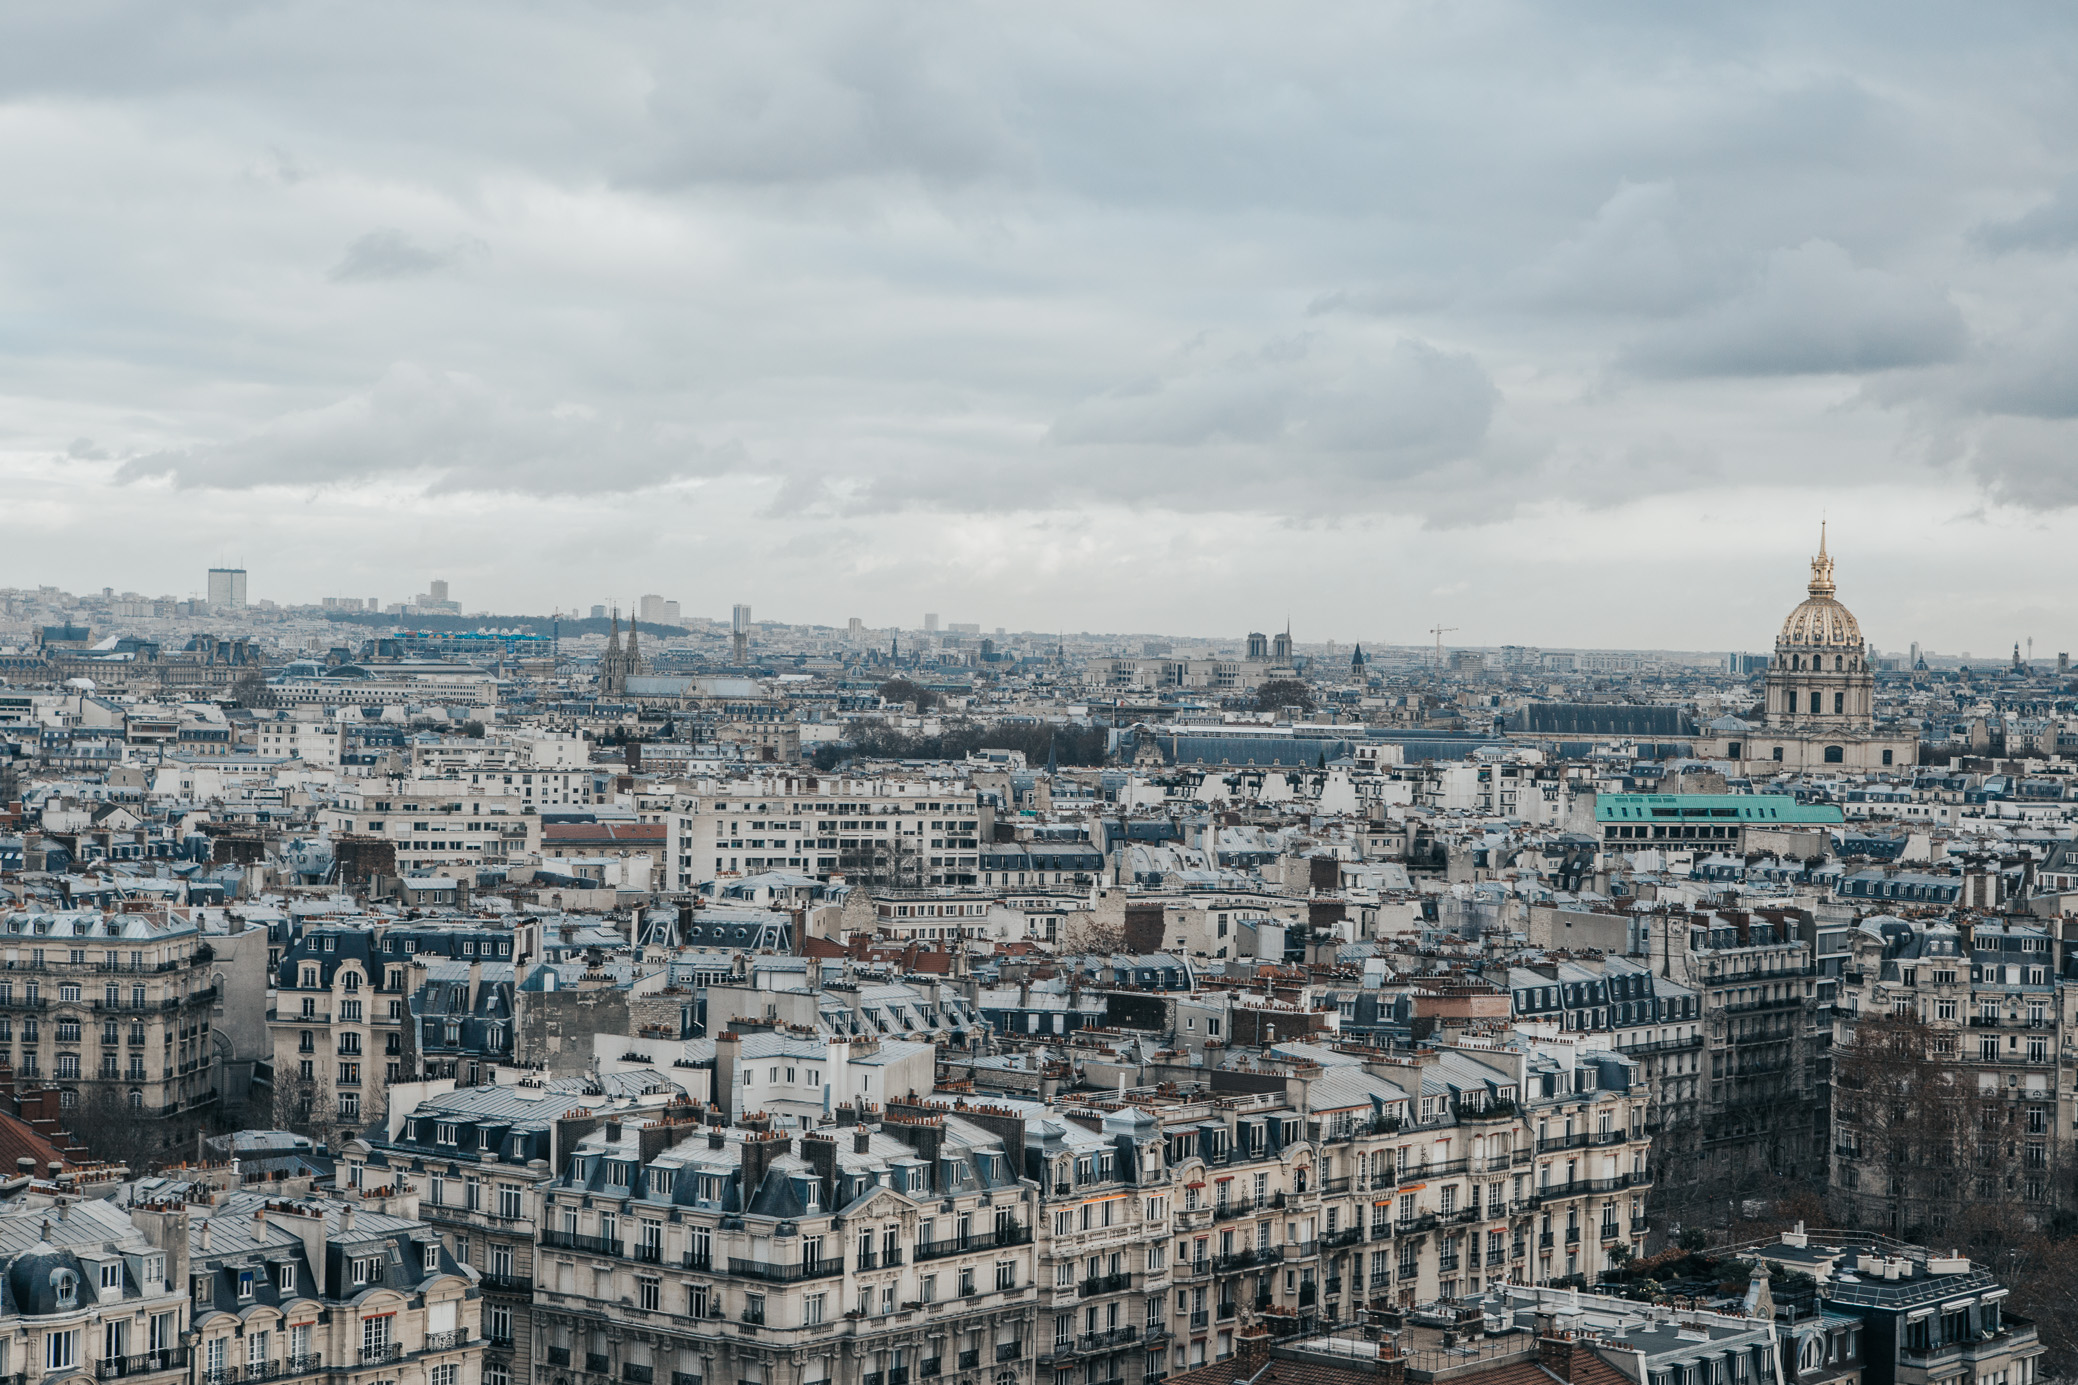 Paris, France | December 10th, 2018 | (Photo by David A. Smith / DSmithScenes)